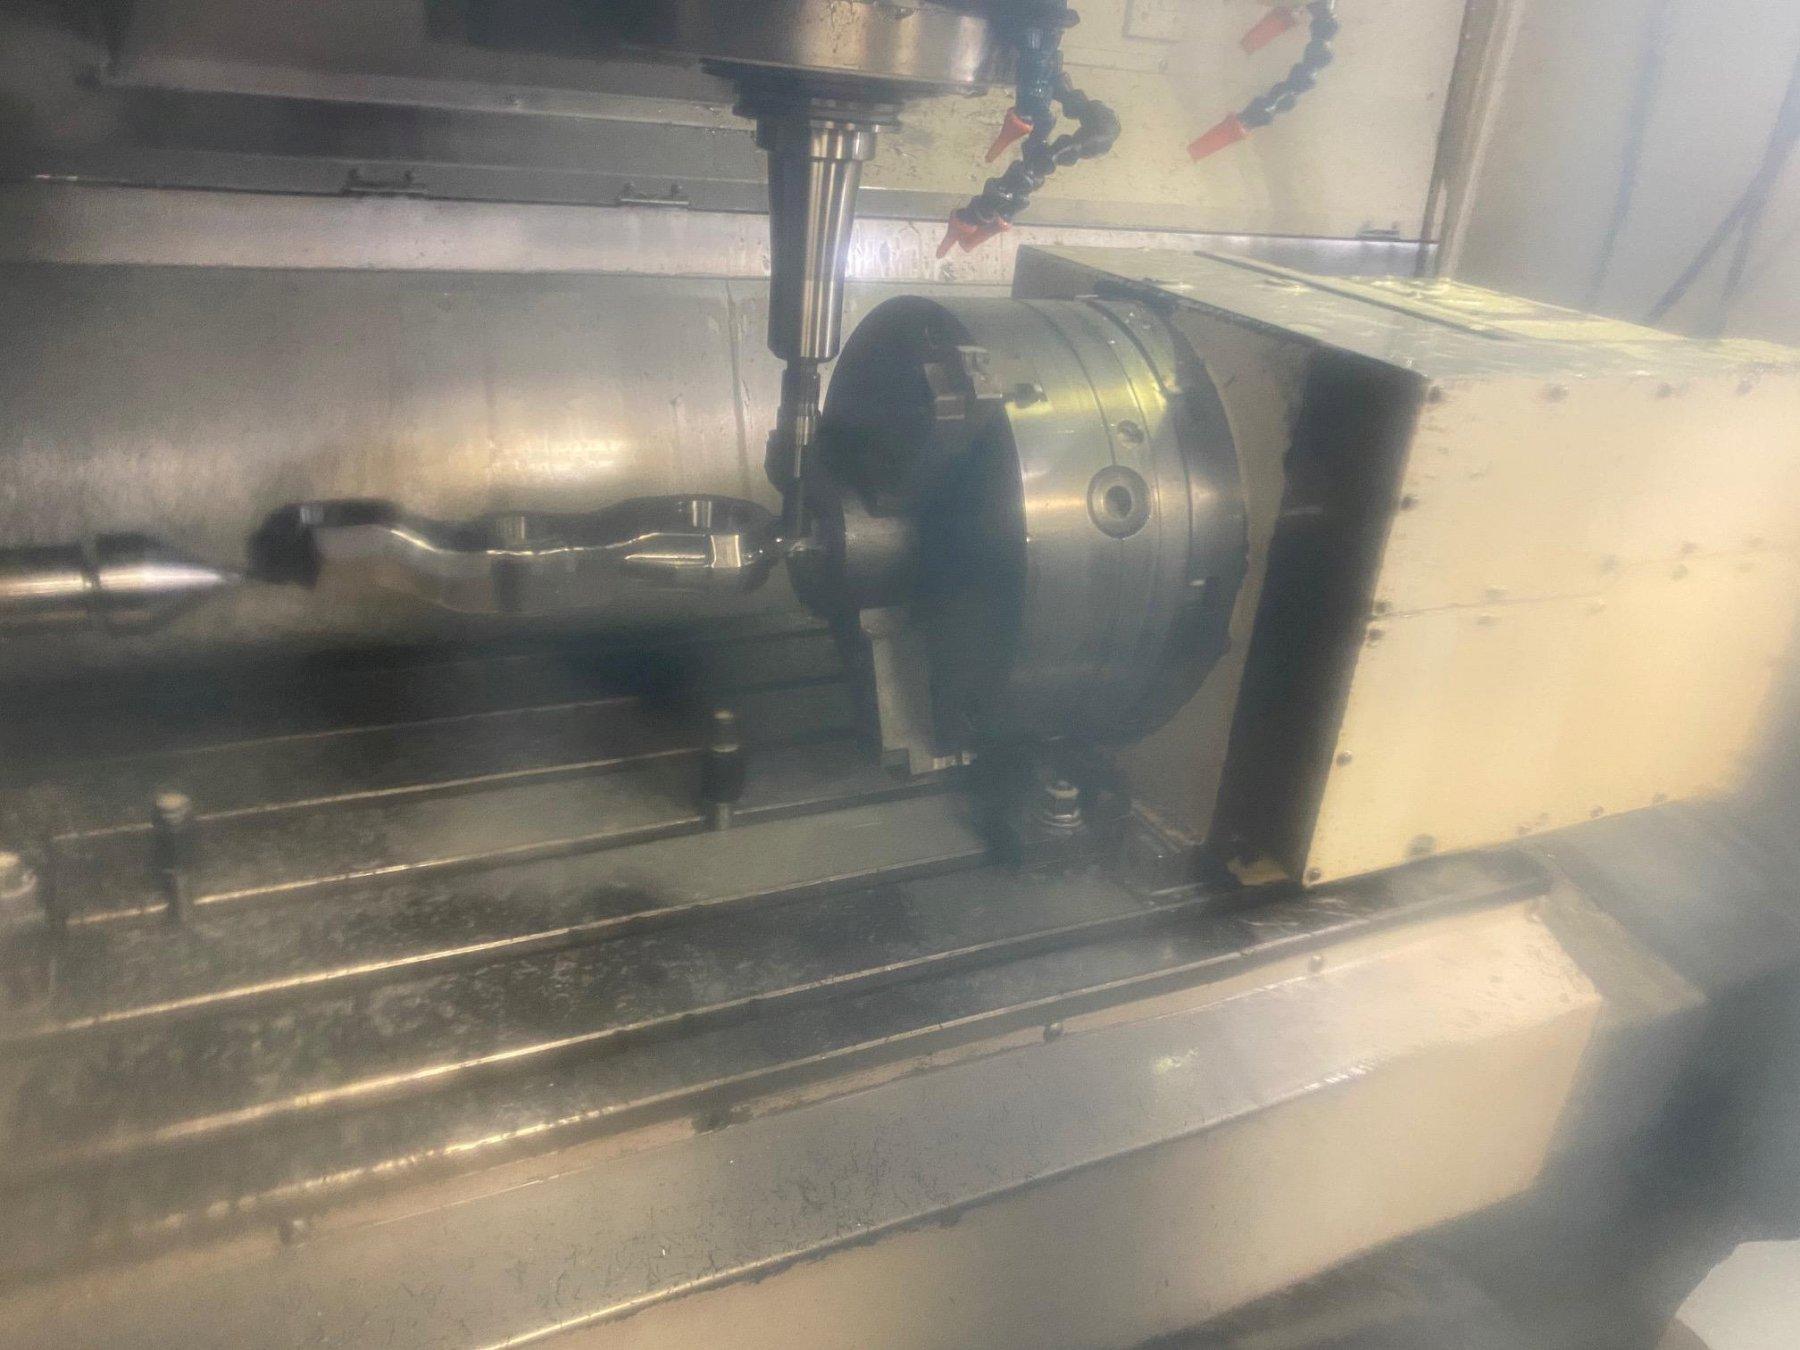 Mori Seiki SV-500/50 Vertical Machining Center